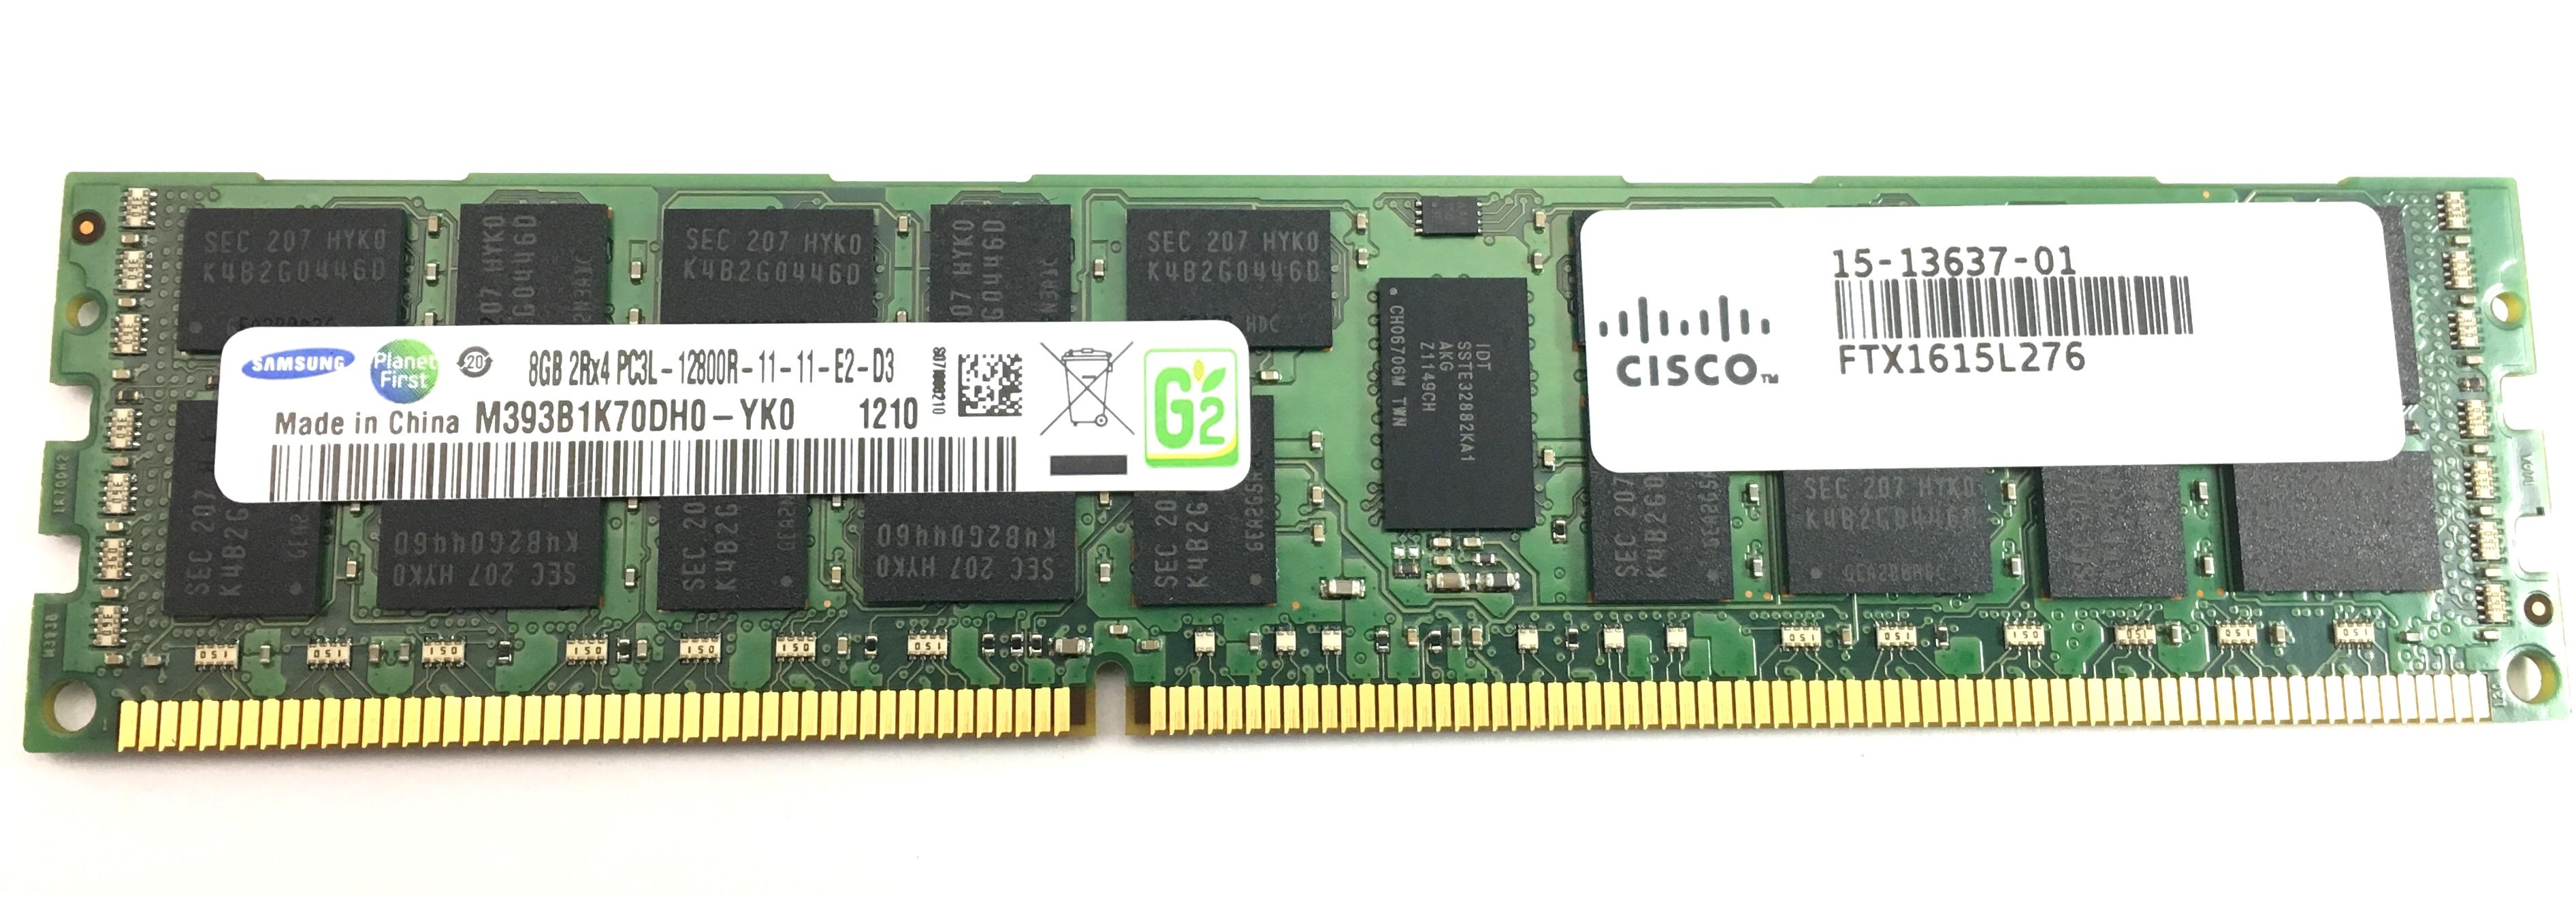 4x Samsung 8GB 1Rx4 PC3L-12800R server memory DDR3 REG-ECC M393B1G70BH0-YK0 32Gb